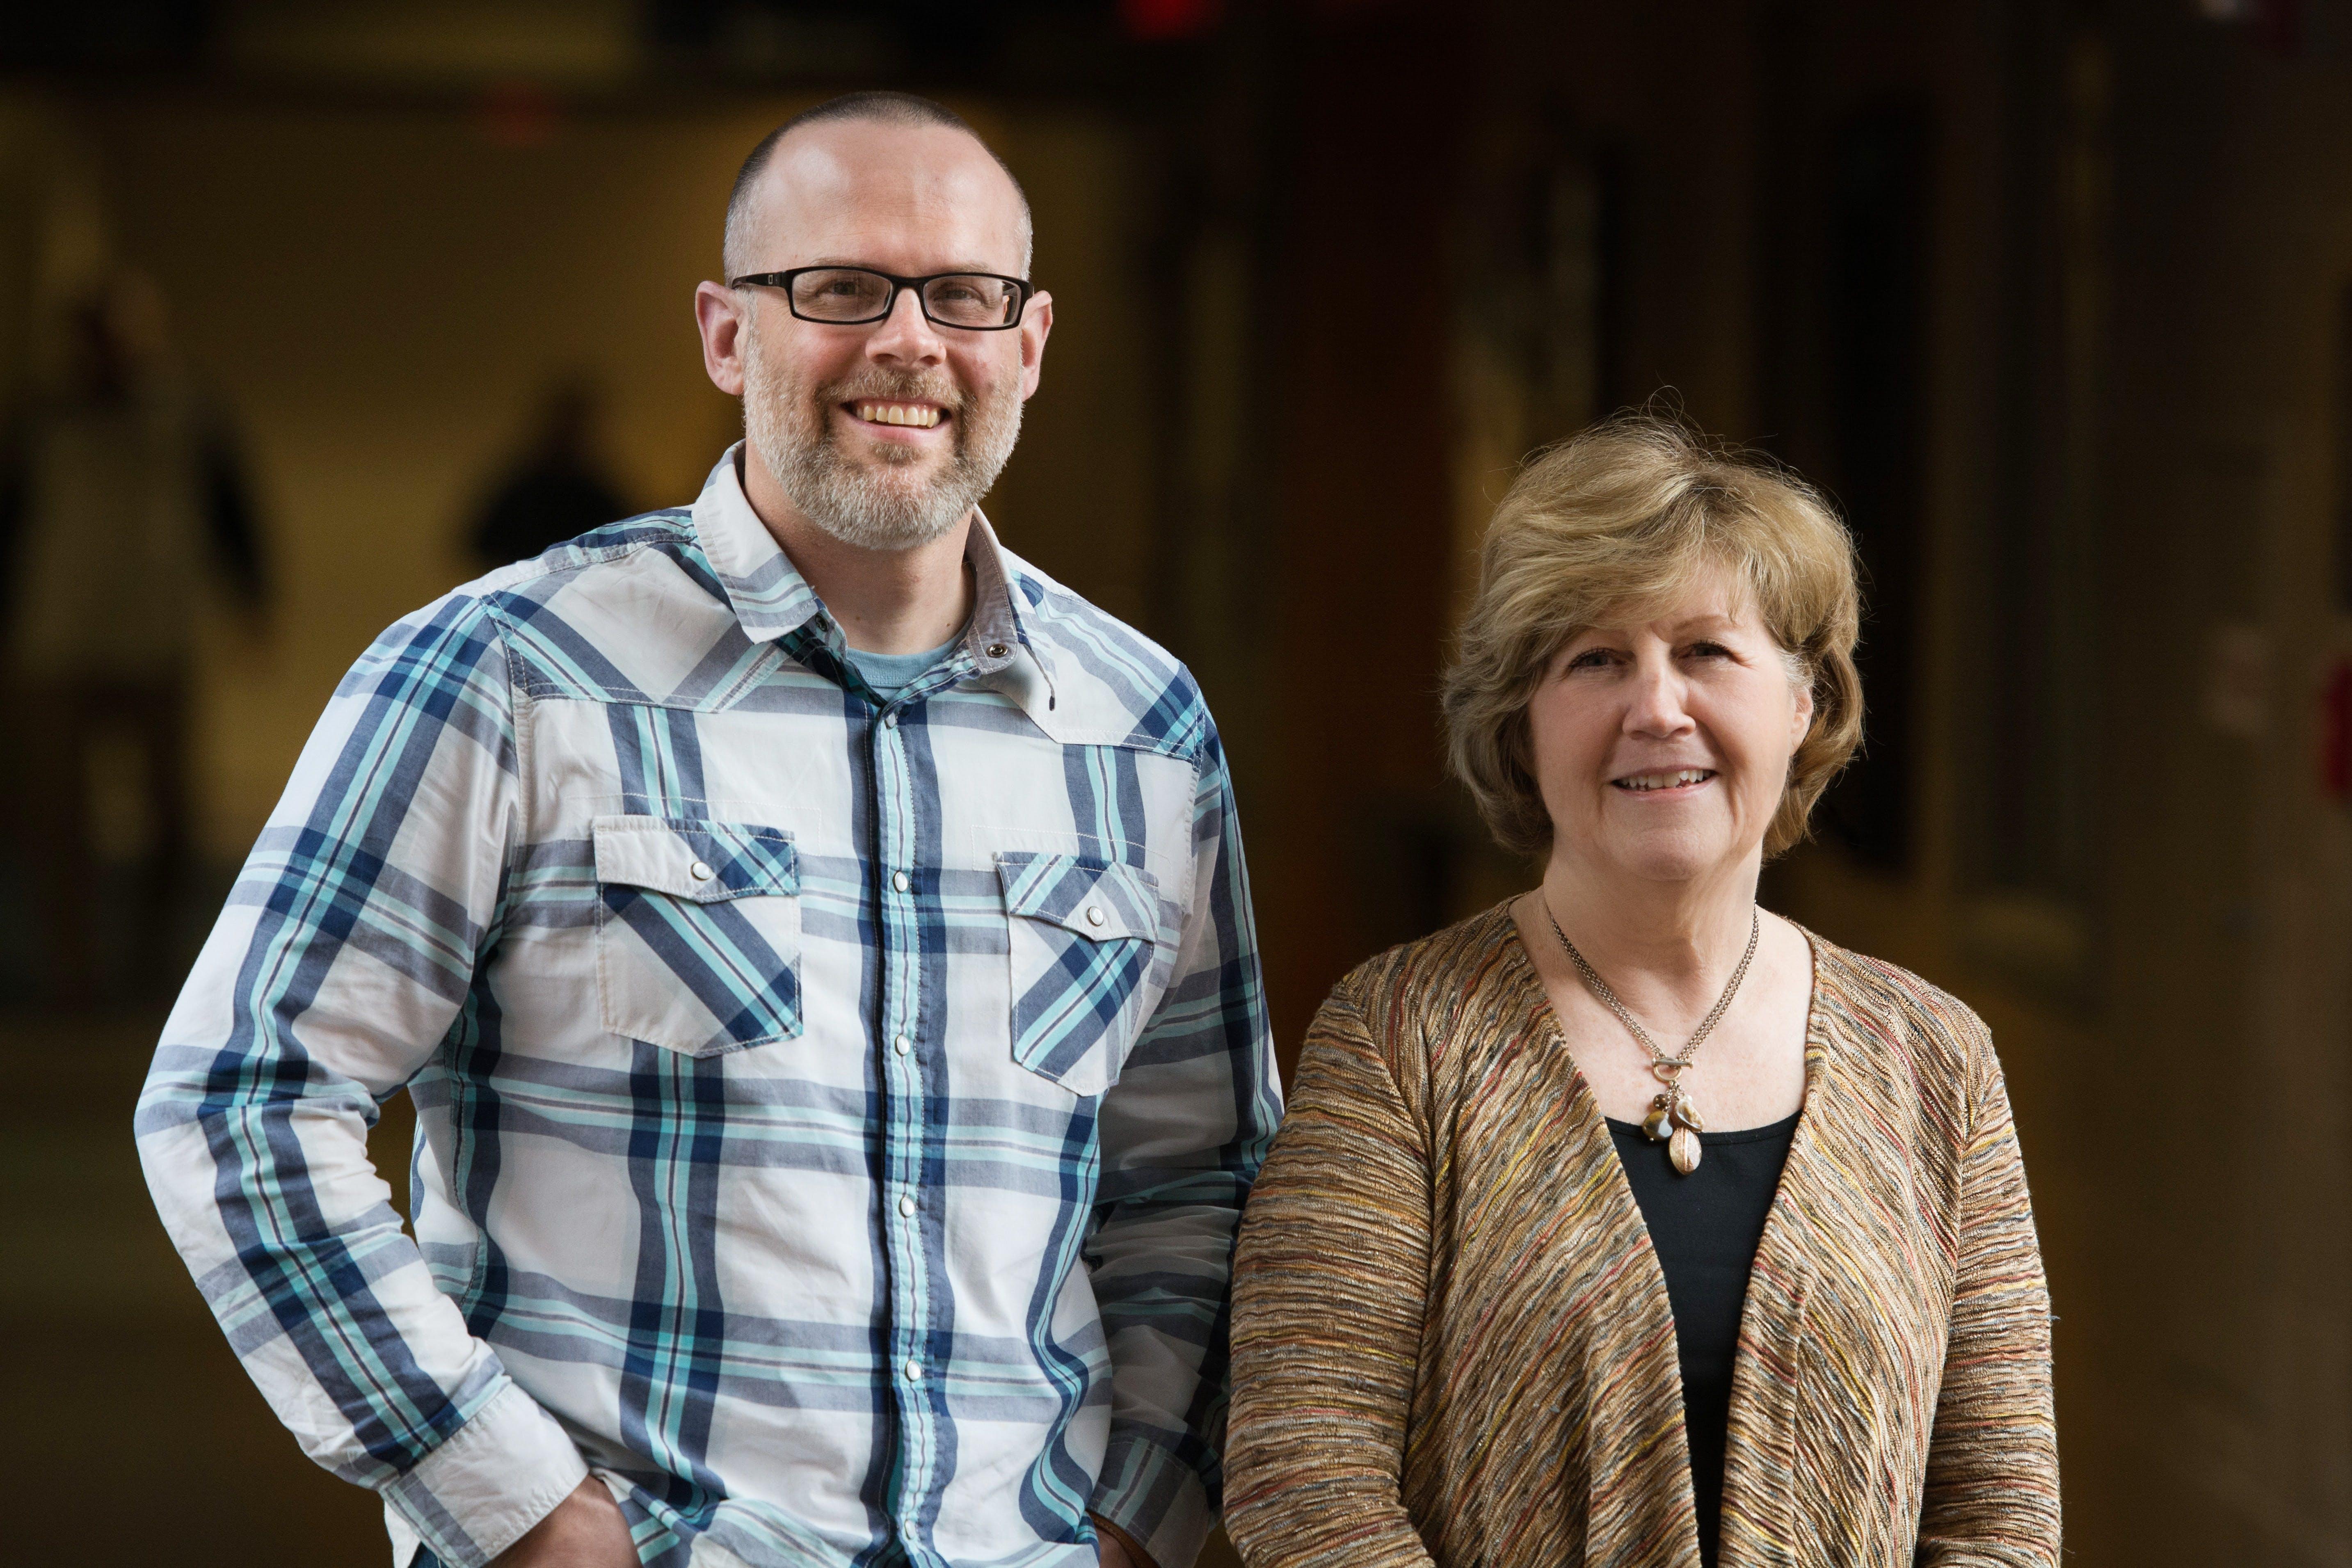 Employees Awarded For Exhibiting Bethel Core Values